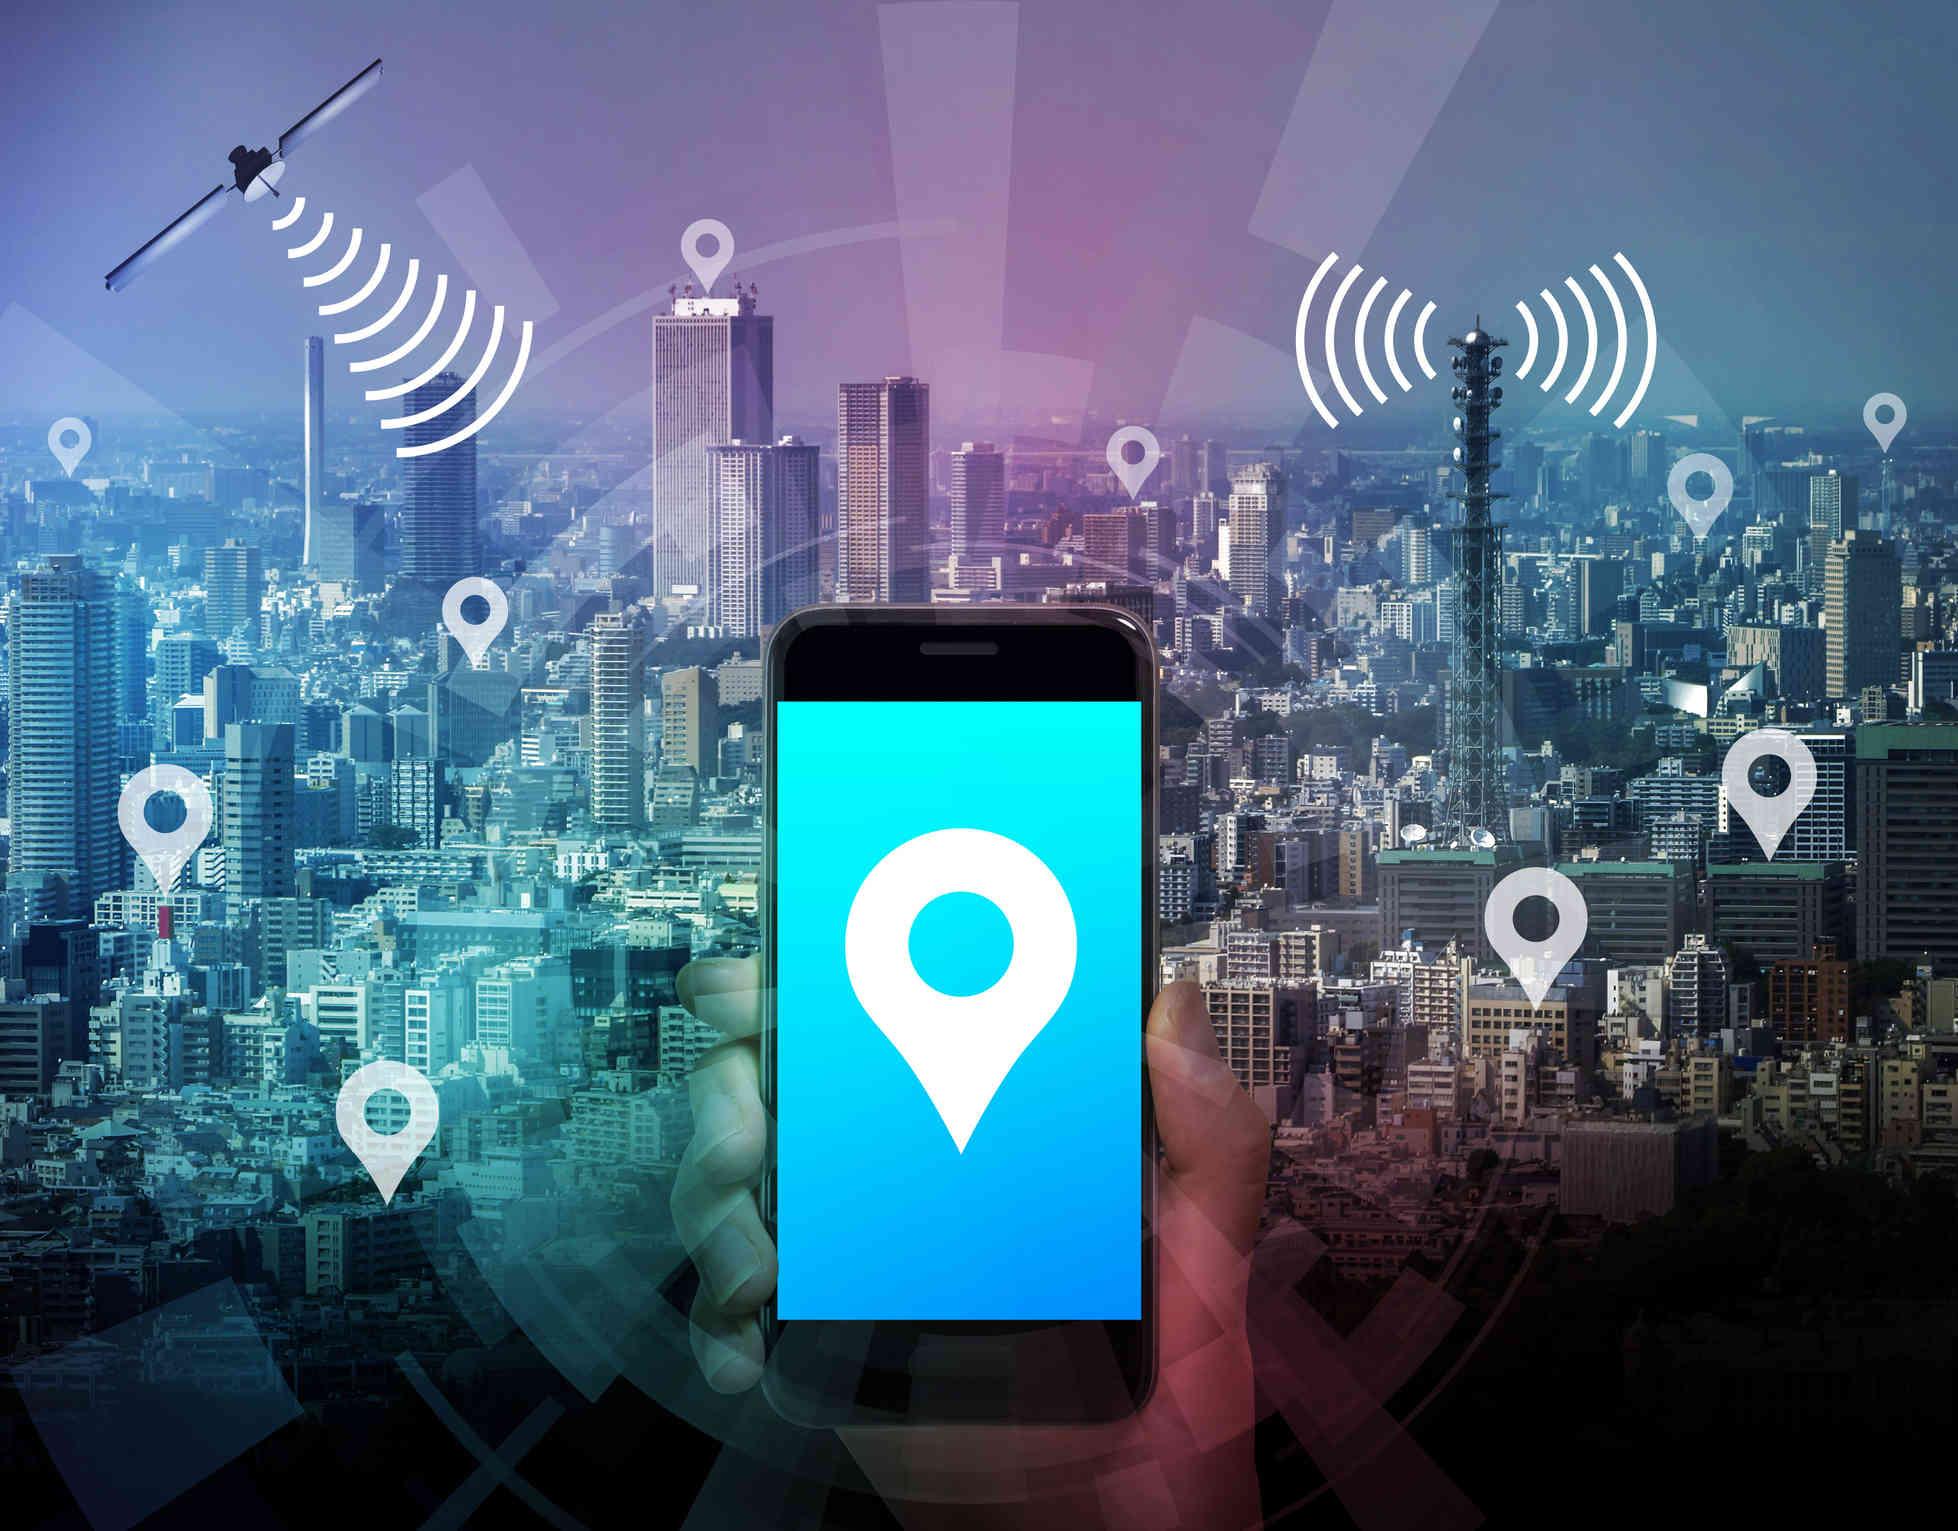 Top 5 Smart City Trends to Watch in 2018